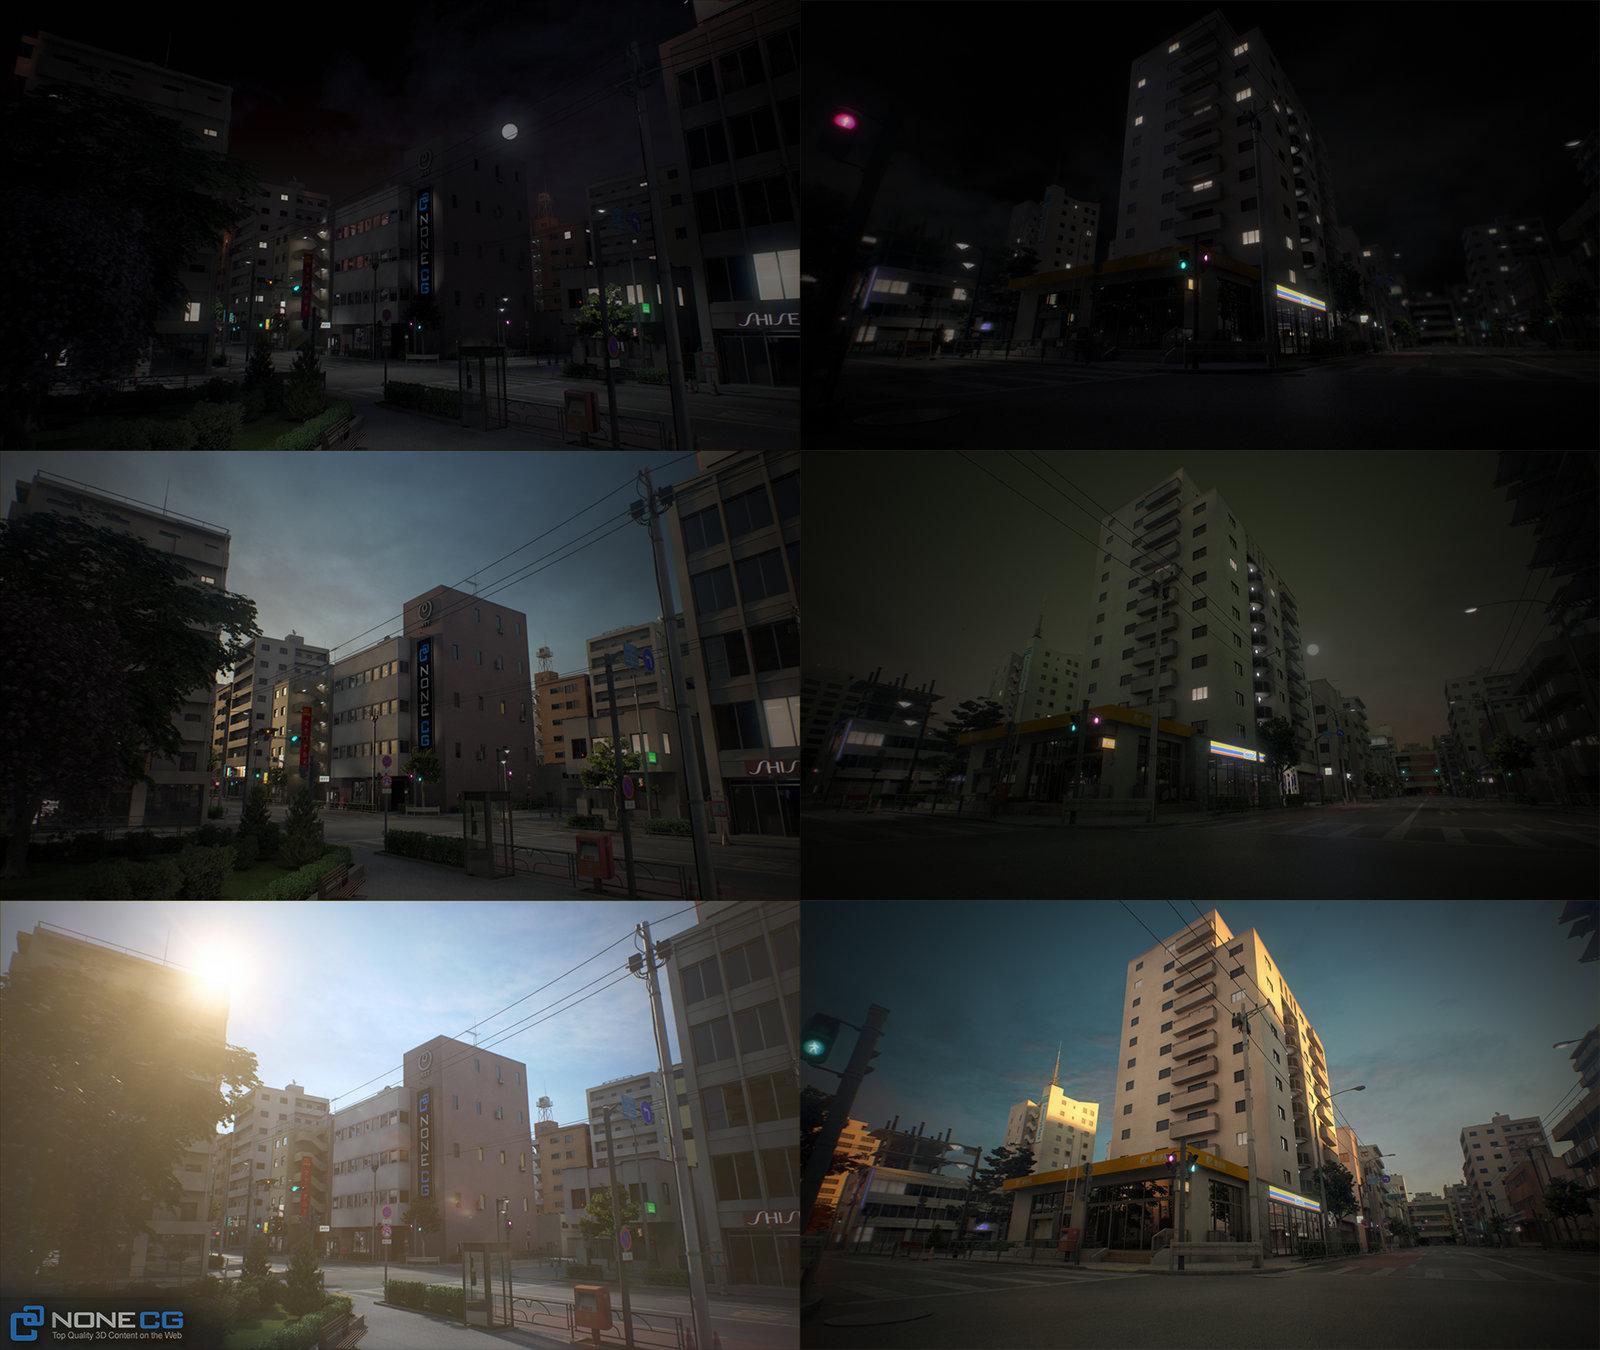 3D Japan City Tileable Blocks by NoneCG